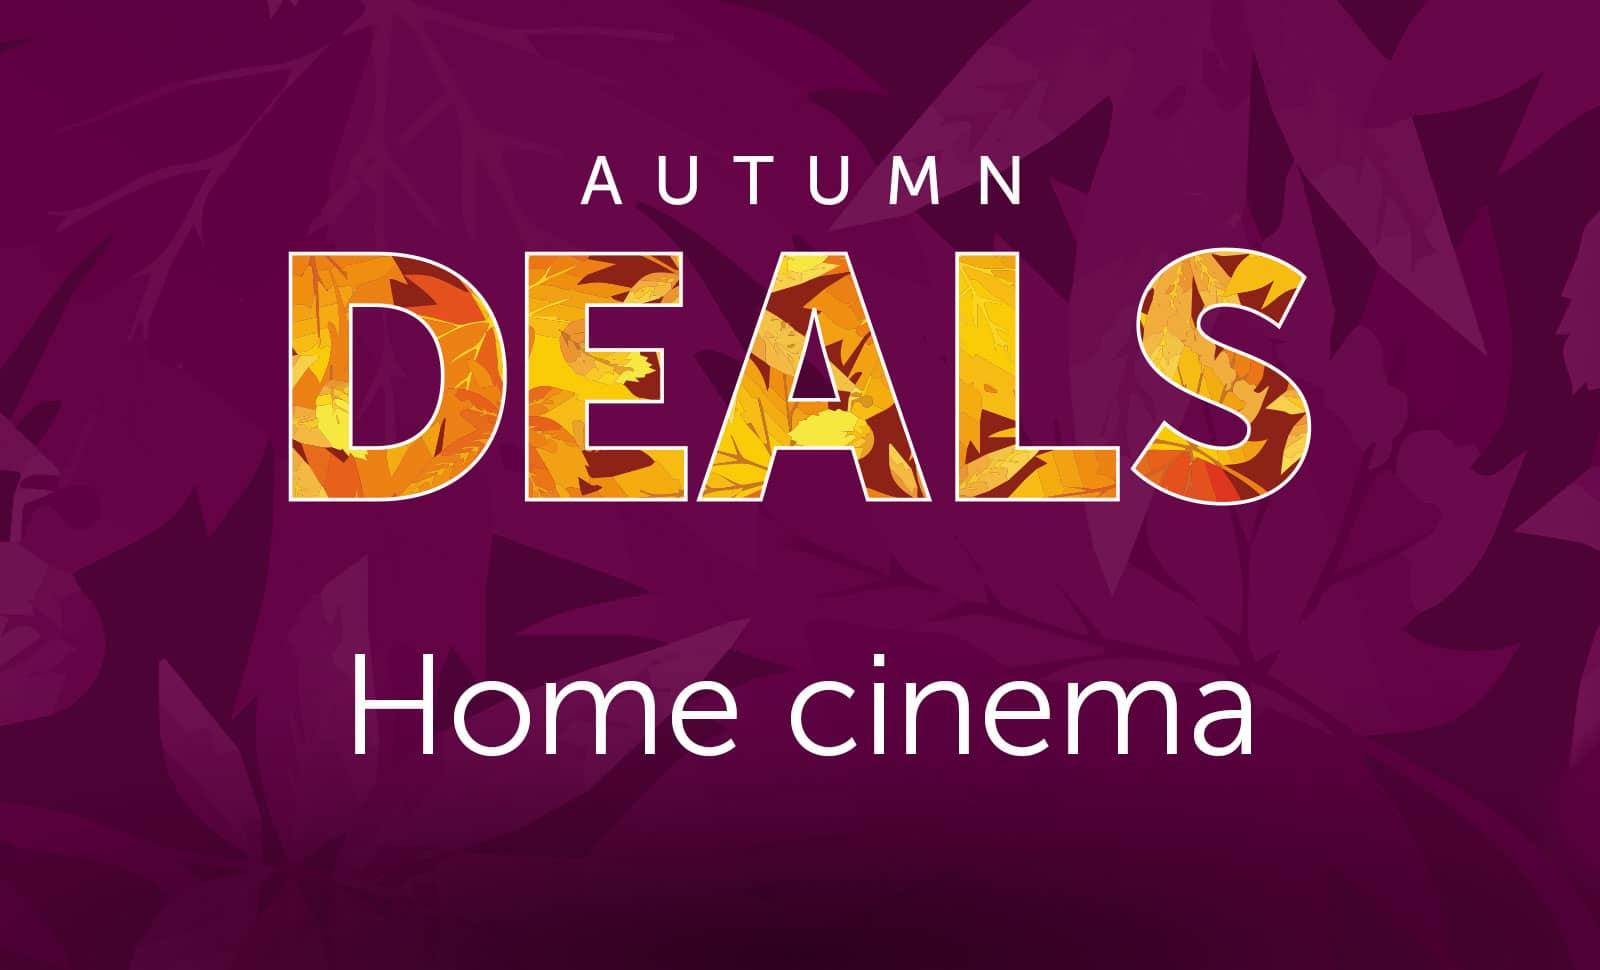 Autumn - Home cinema